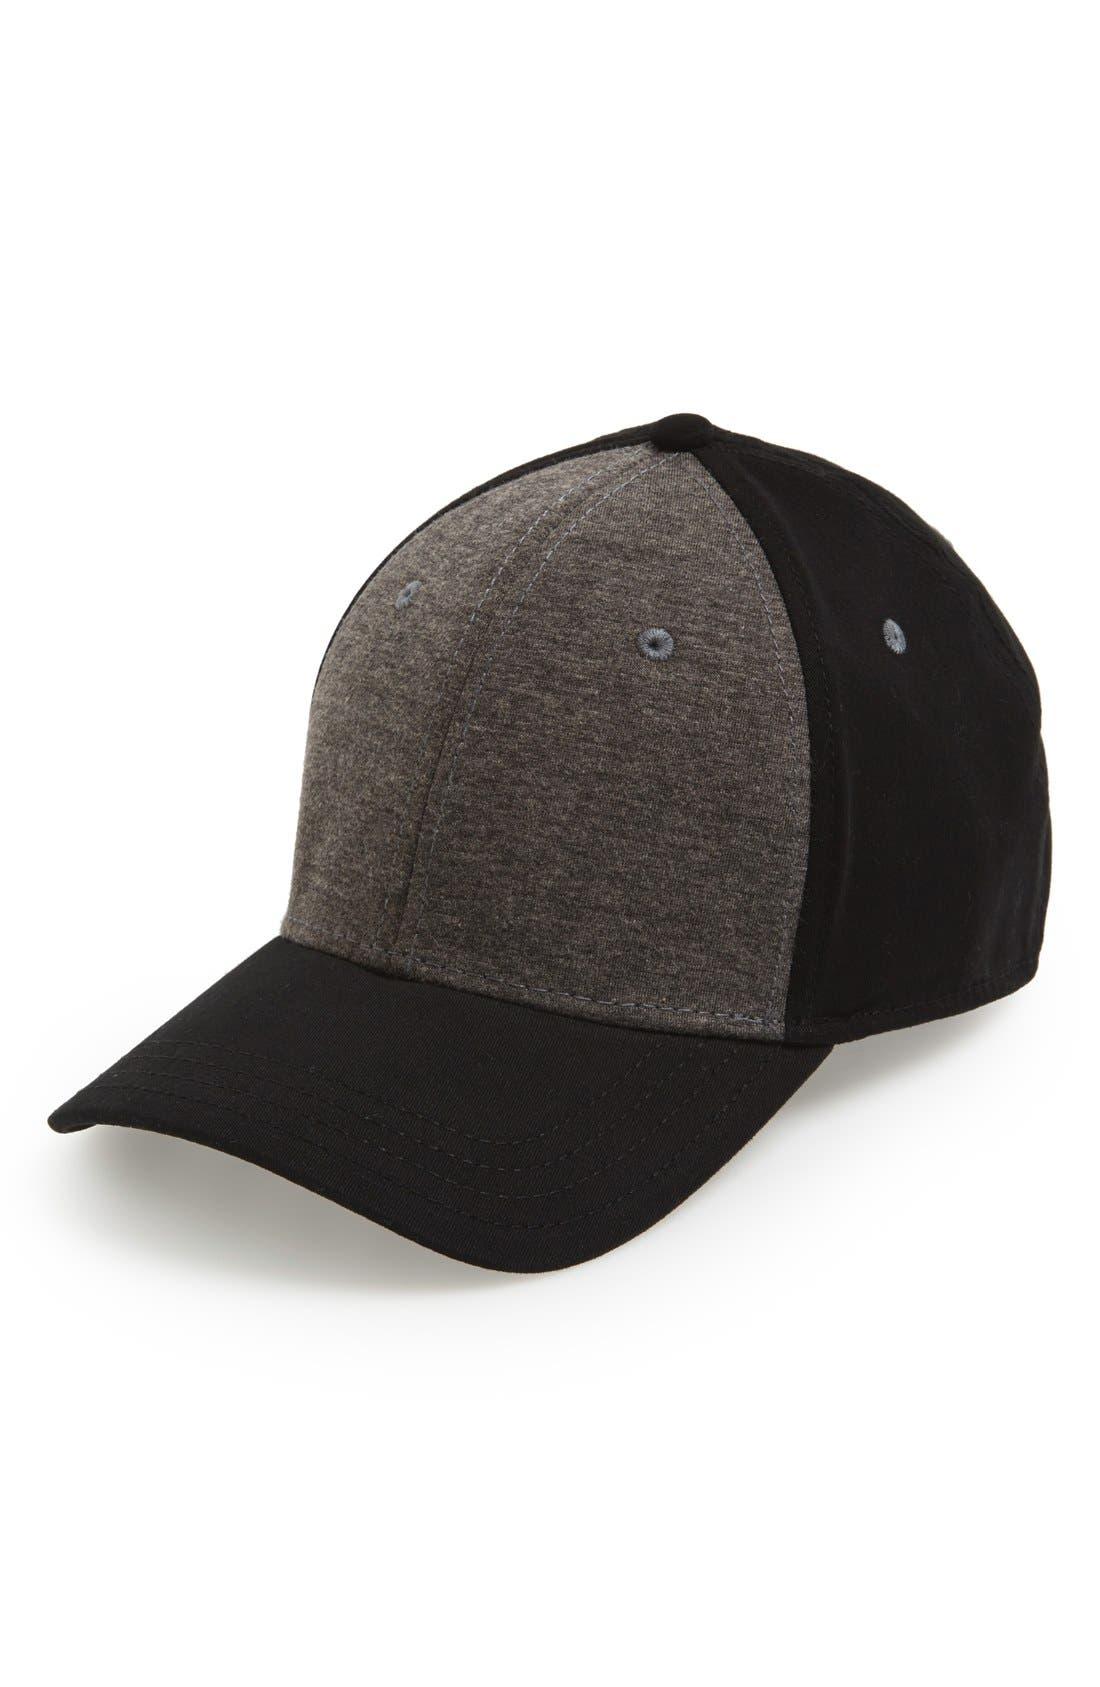 Gents Jersey Knit Baseball Cap